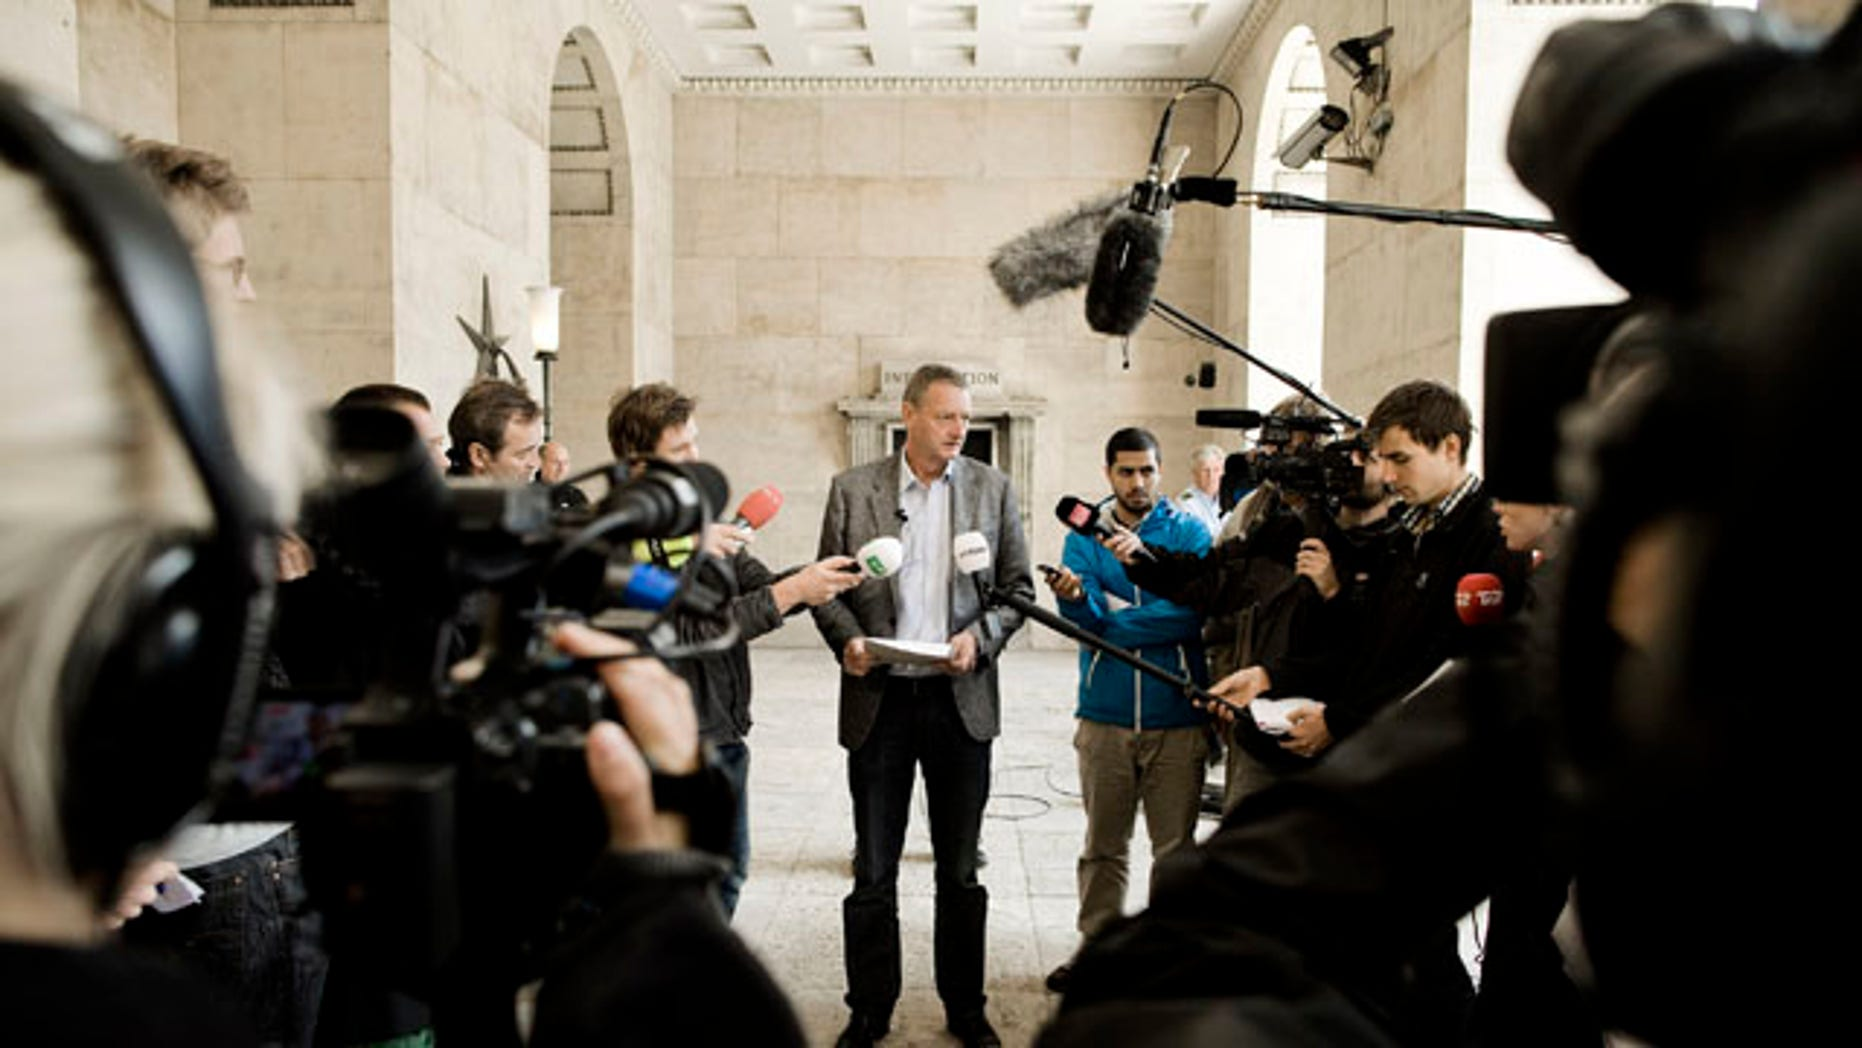 September 15: Investigator Svend Foldager of the Danish Police, talks to the media in Copenhagen, Denmark, regarding the man being held suspected of setting off a small explosion in a Copenhagen hotel. (AP)